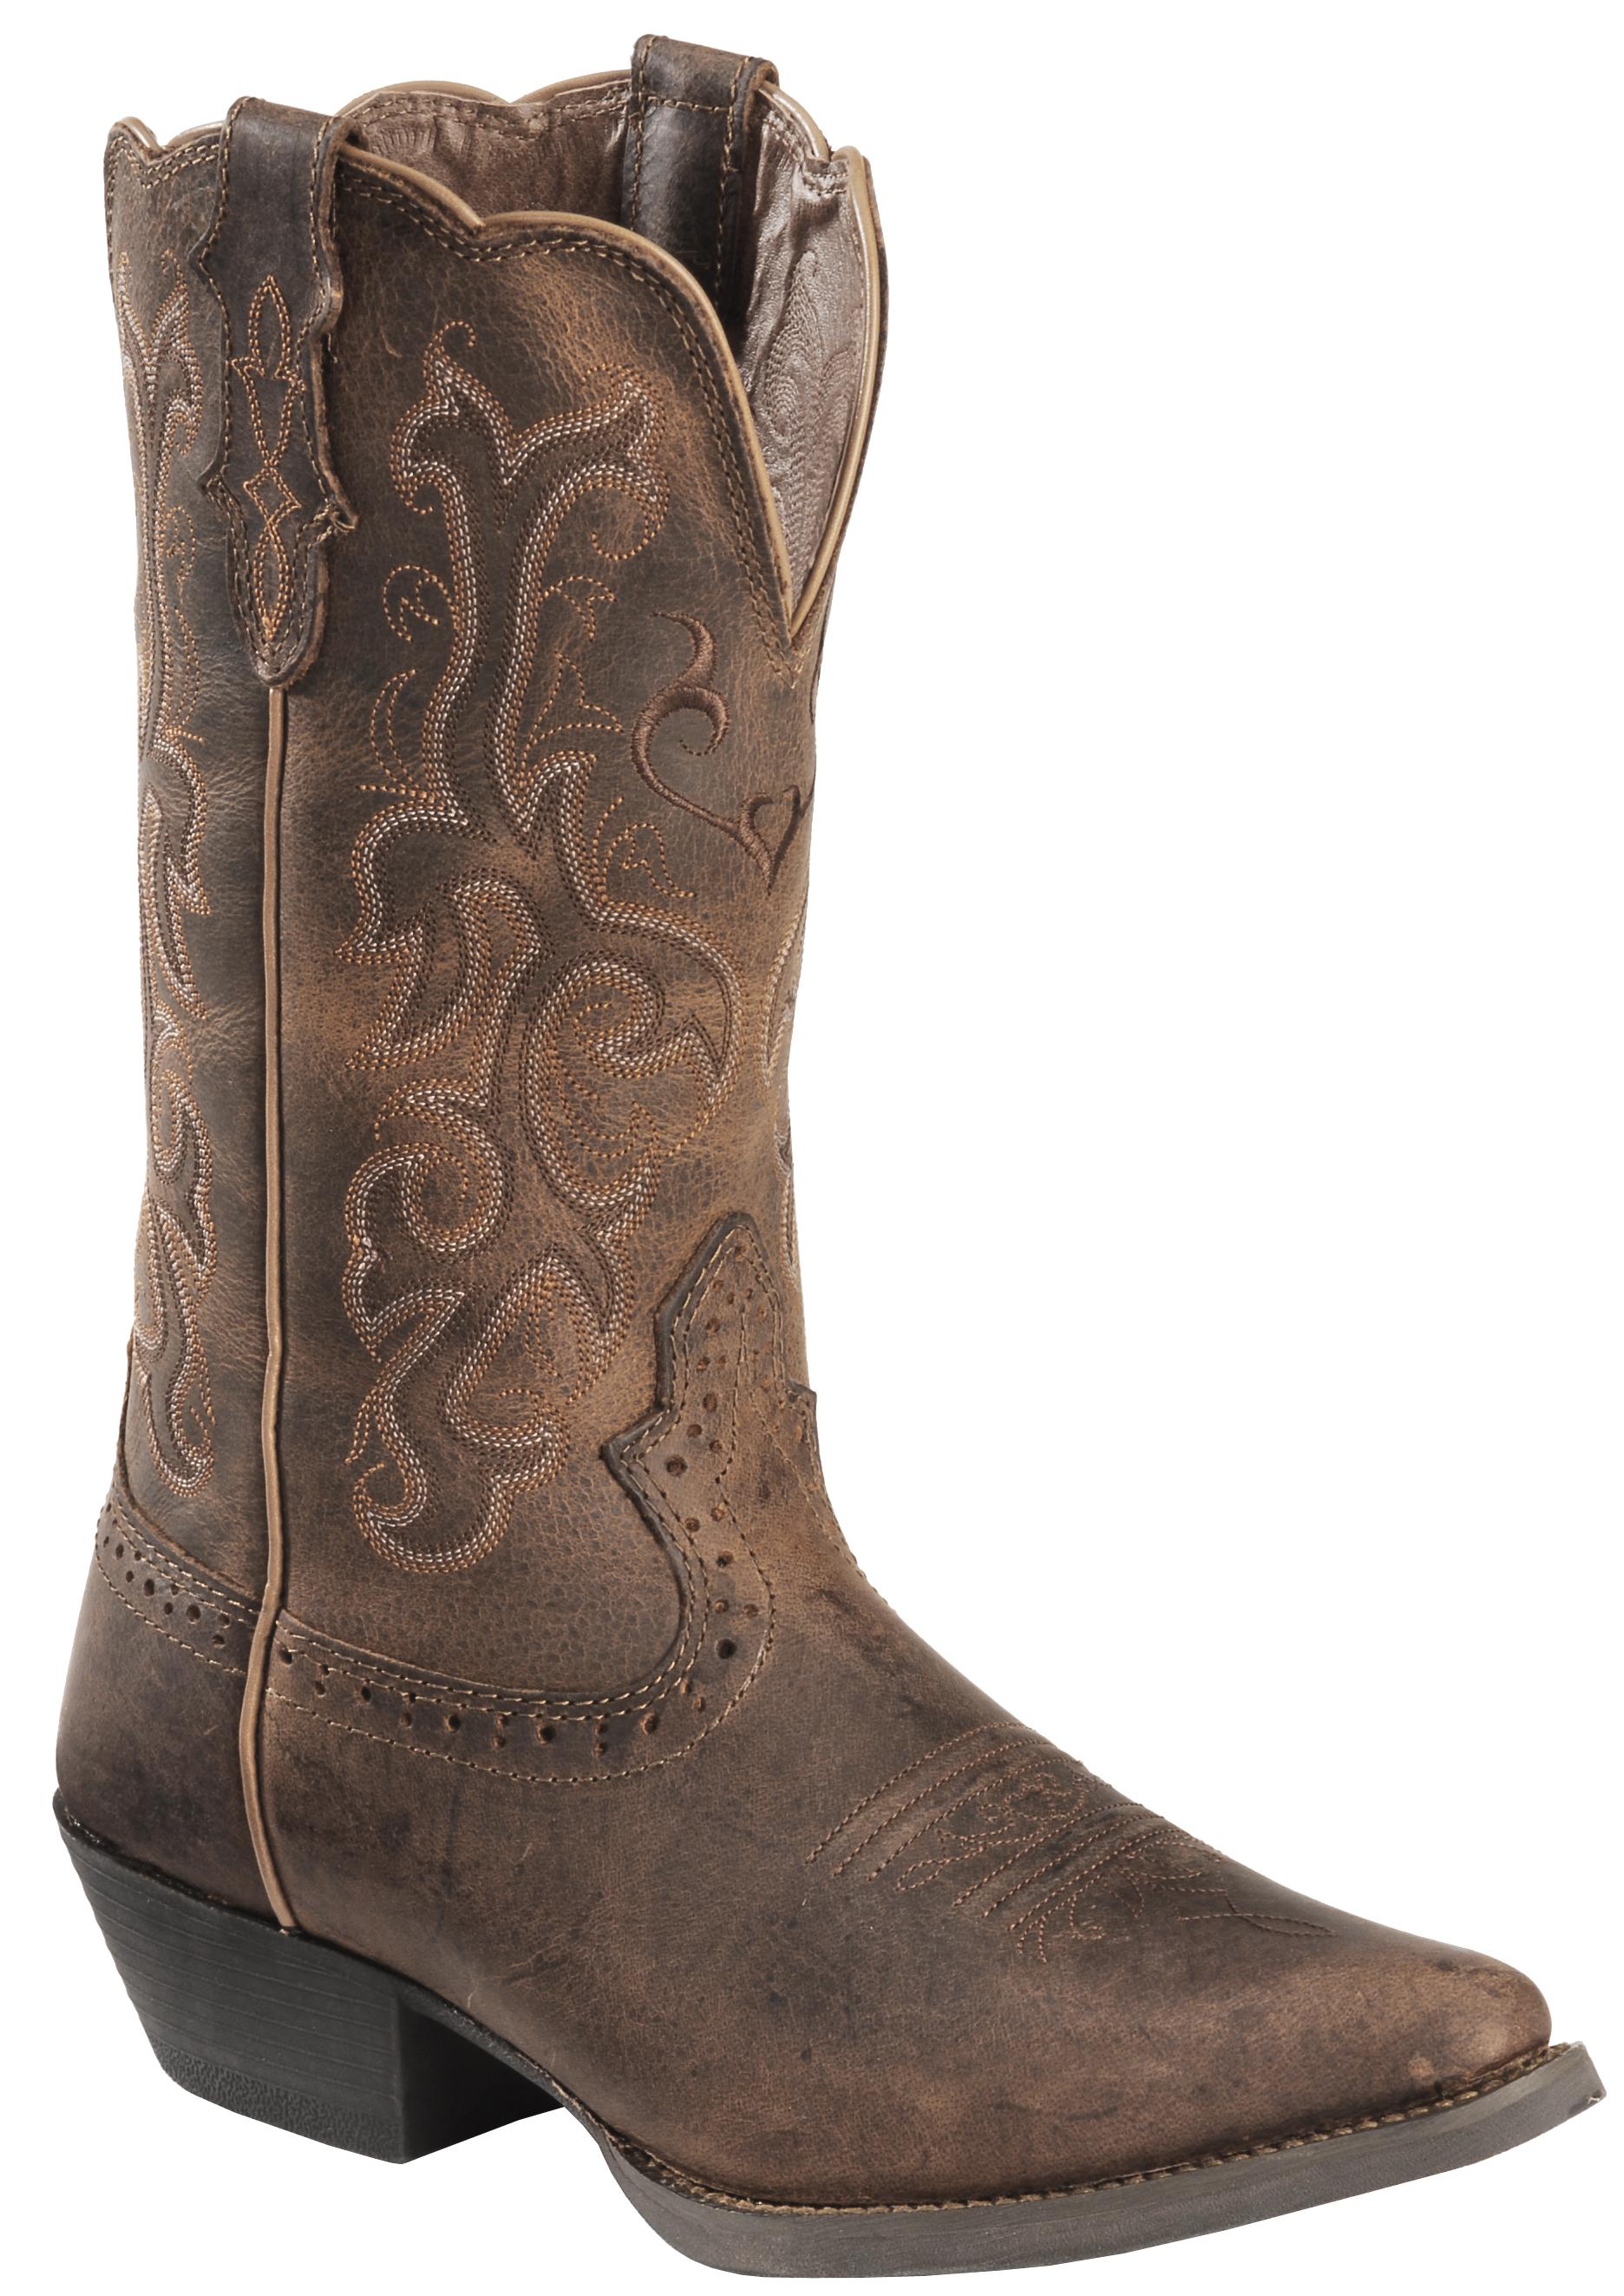 Justin Distressed Puma Cowhide Stampede Cowgirl Boots Snip Toe Sheplers